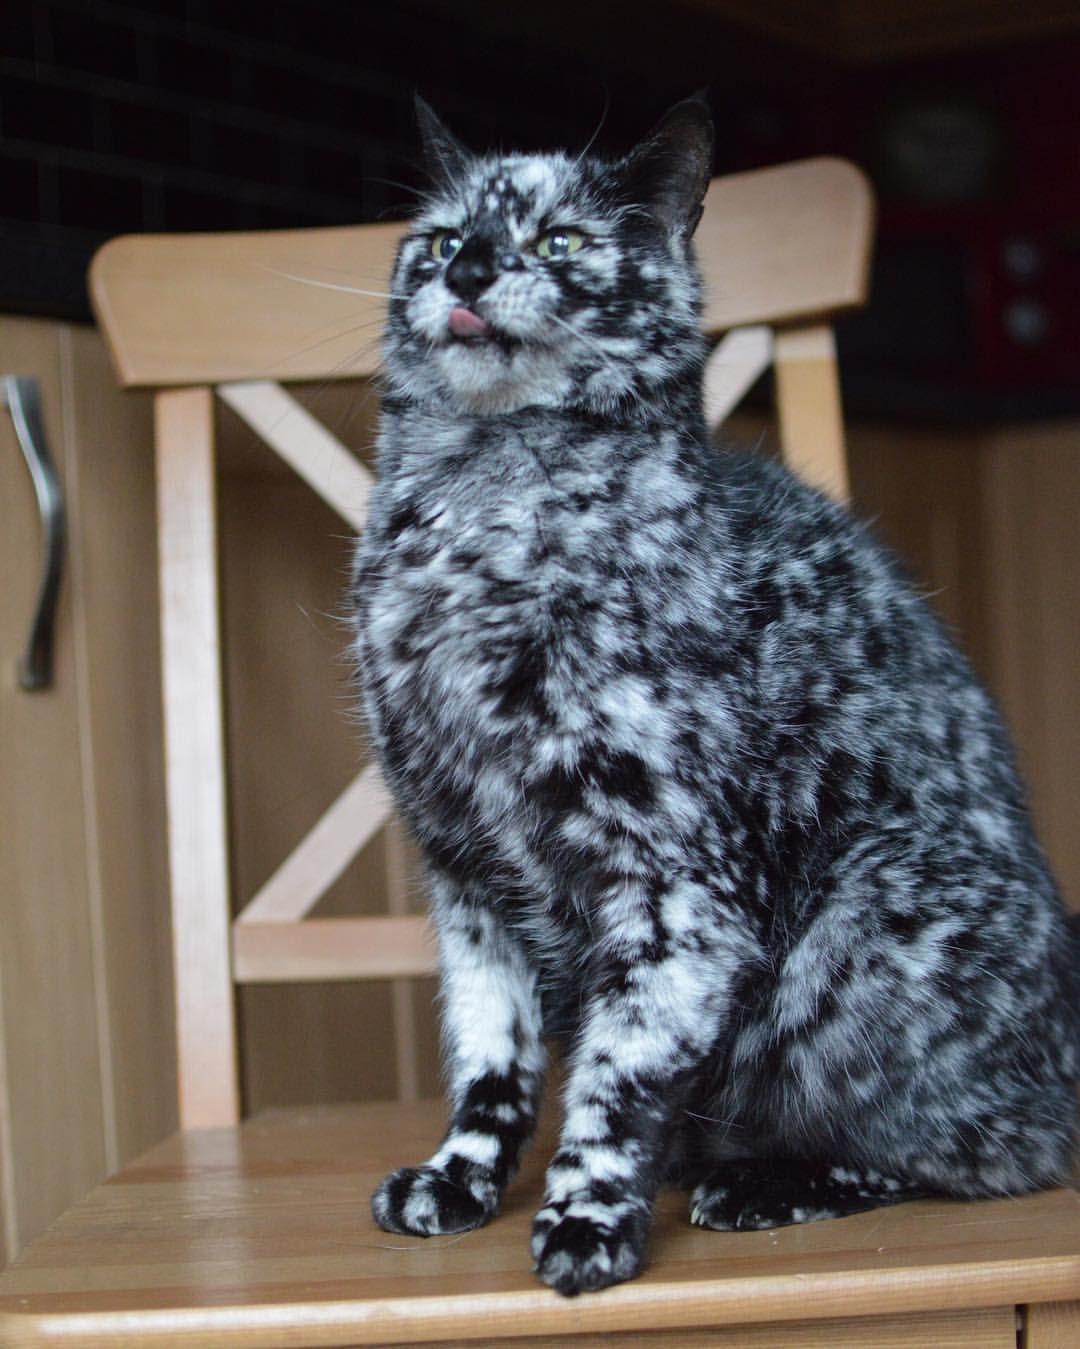 The Ever So Majestic Scrappy Topcatphoto Elegant Cats Igcatjunky Furrendsupclose Flaffy101cats Igcatclub S Cute Animals Pretty Cats Beautiful Cats